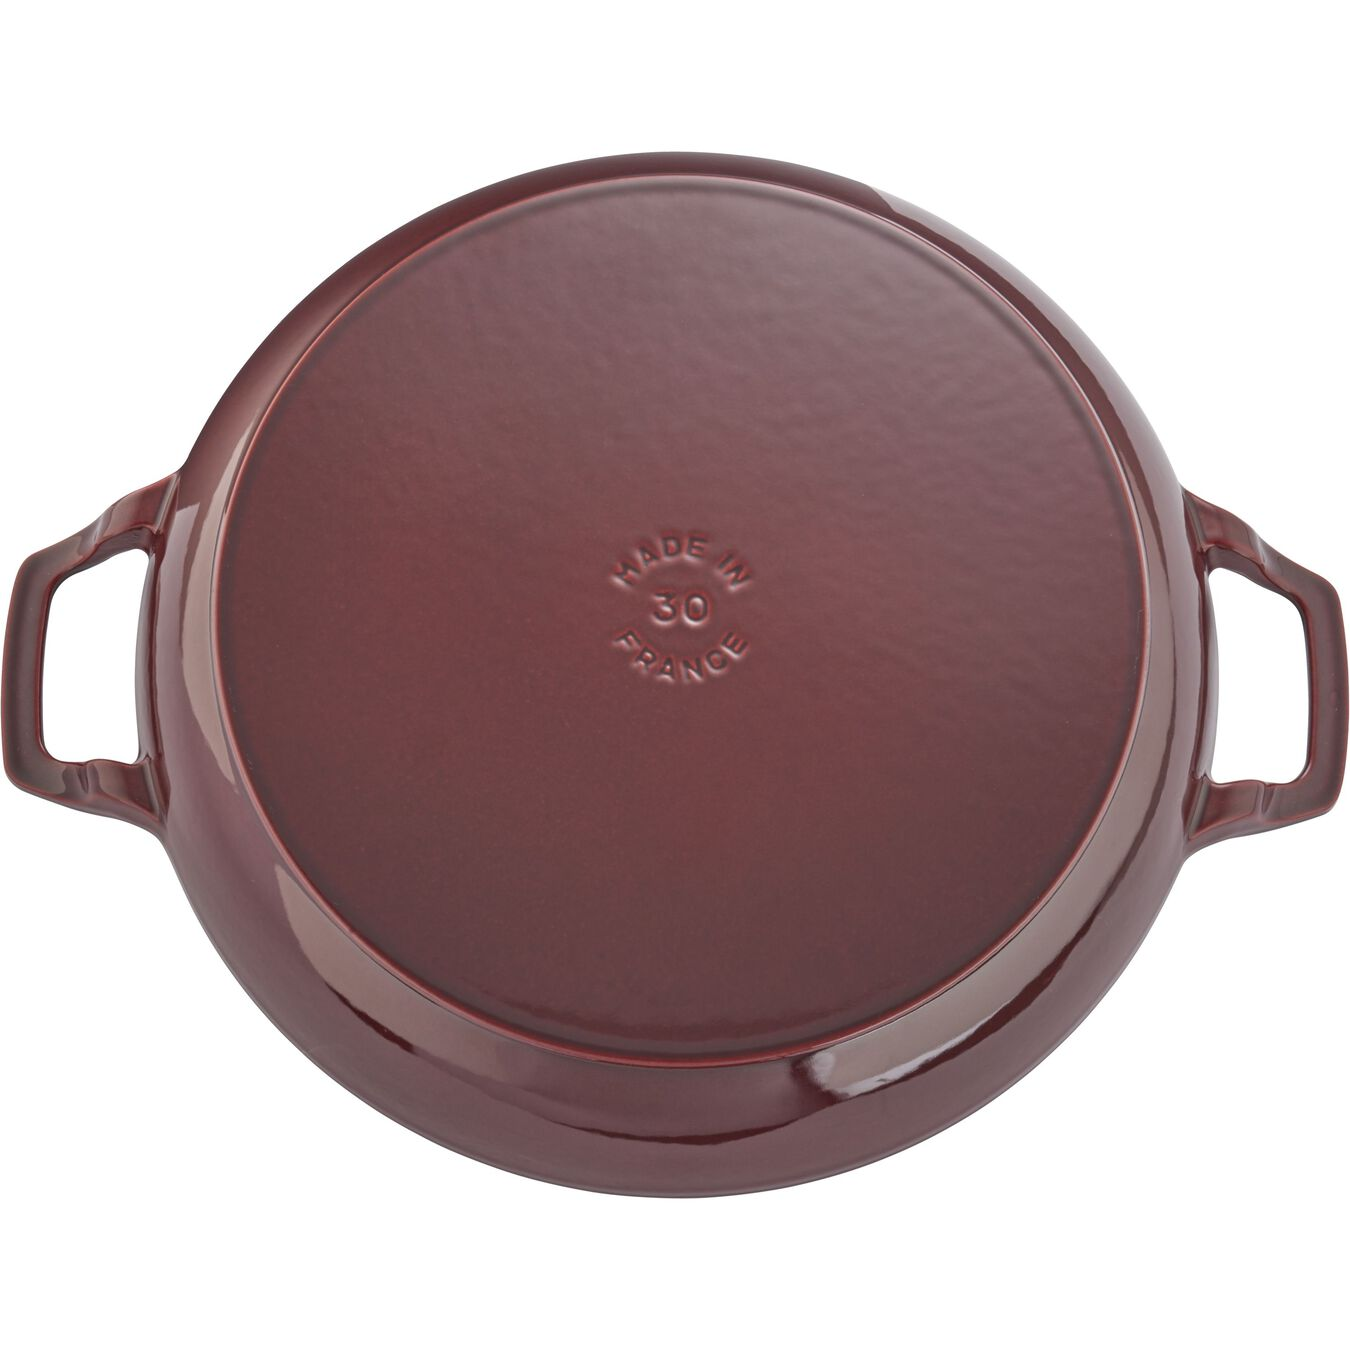 3,5 l Cast iron round Braisière, Grenadine-Red,,large 3